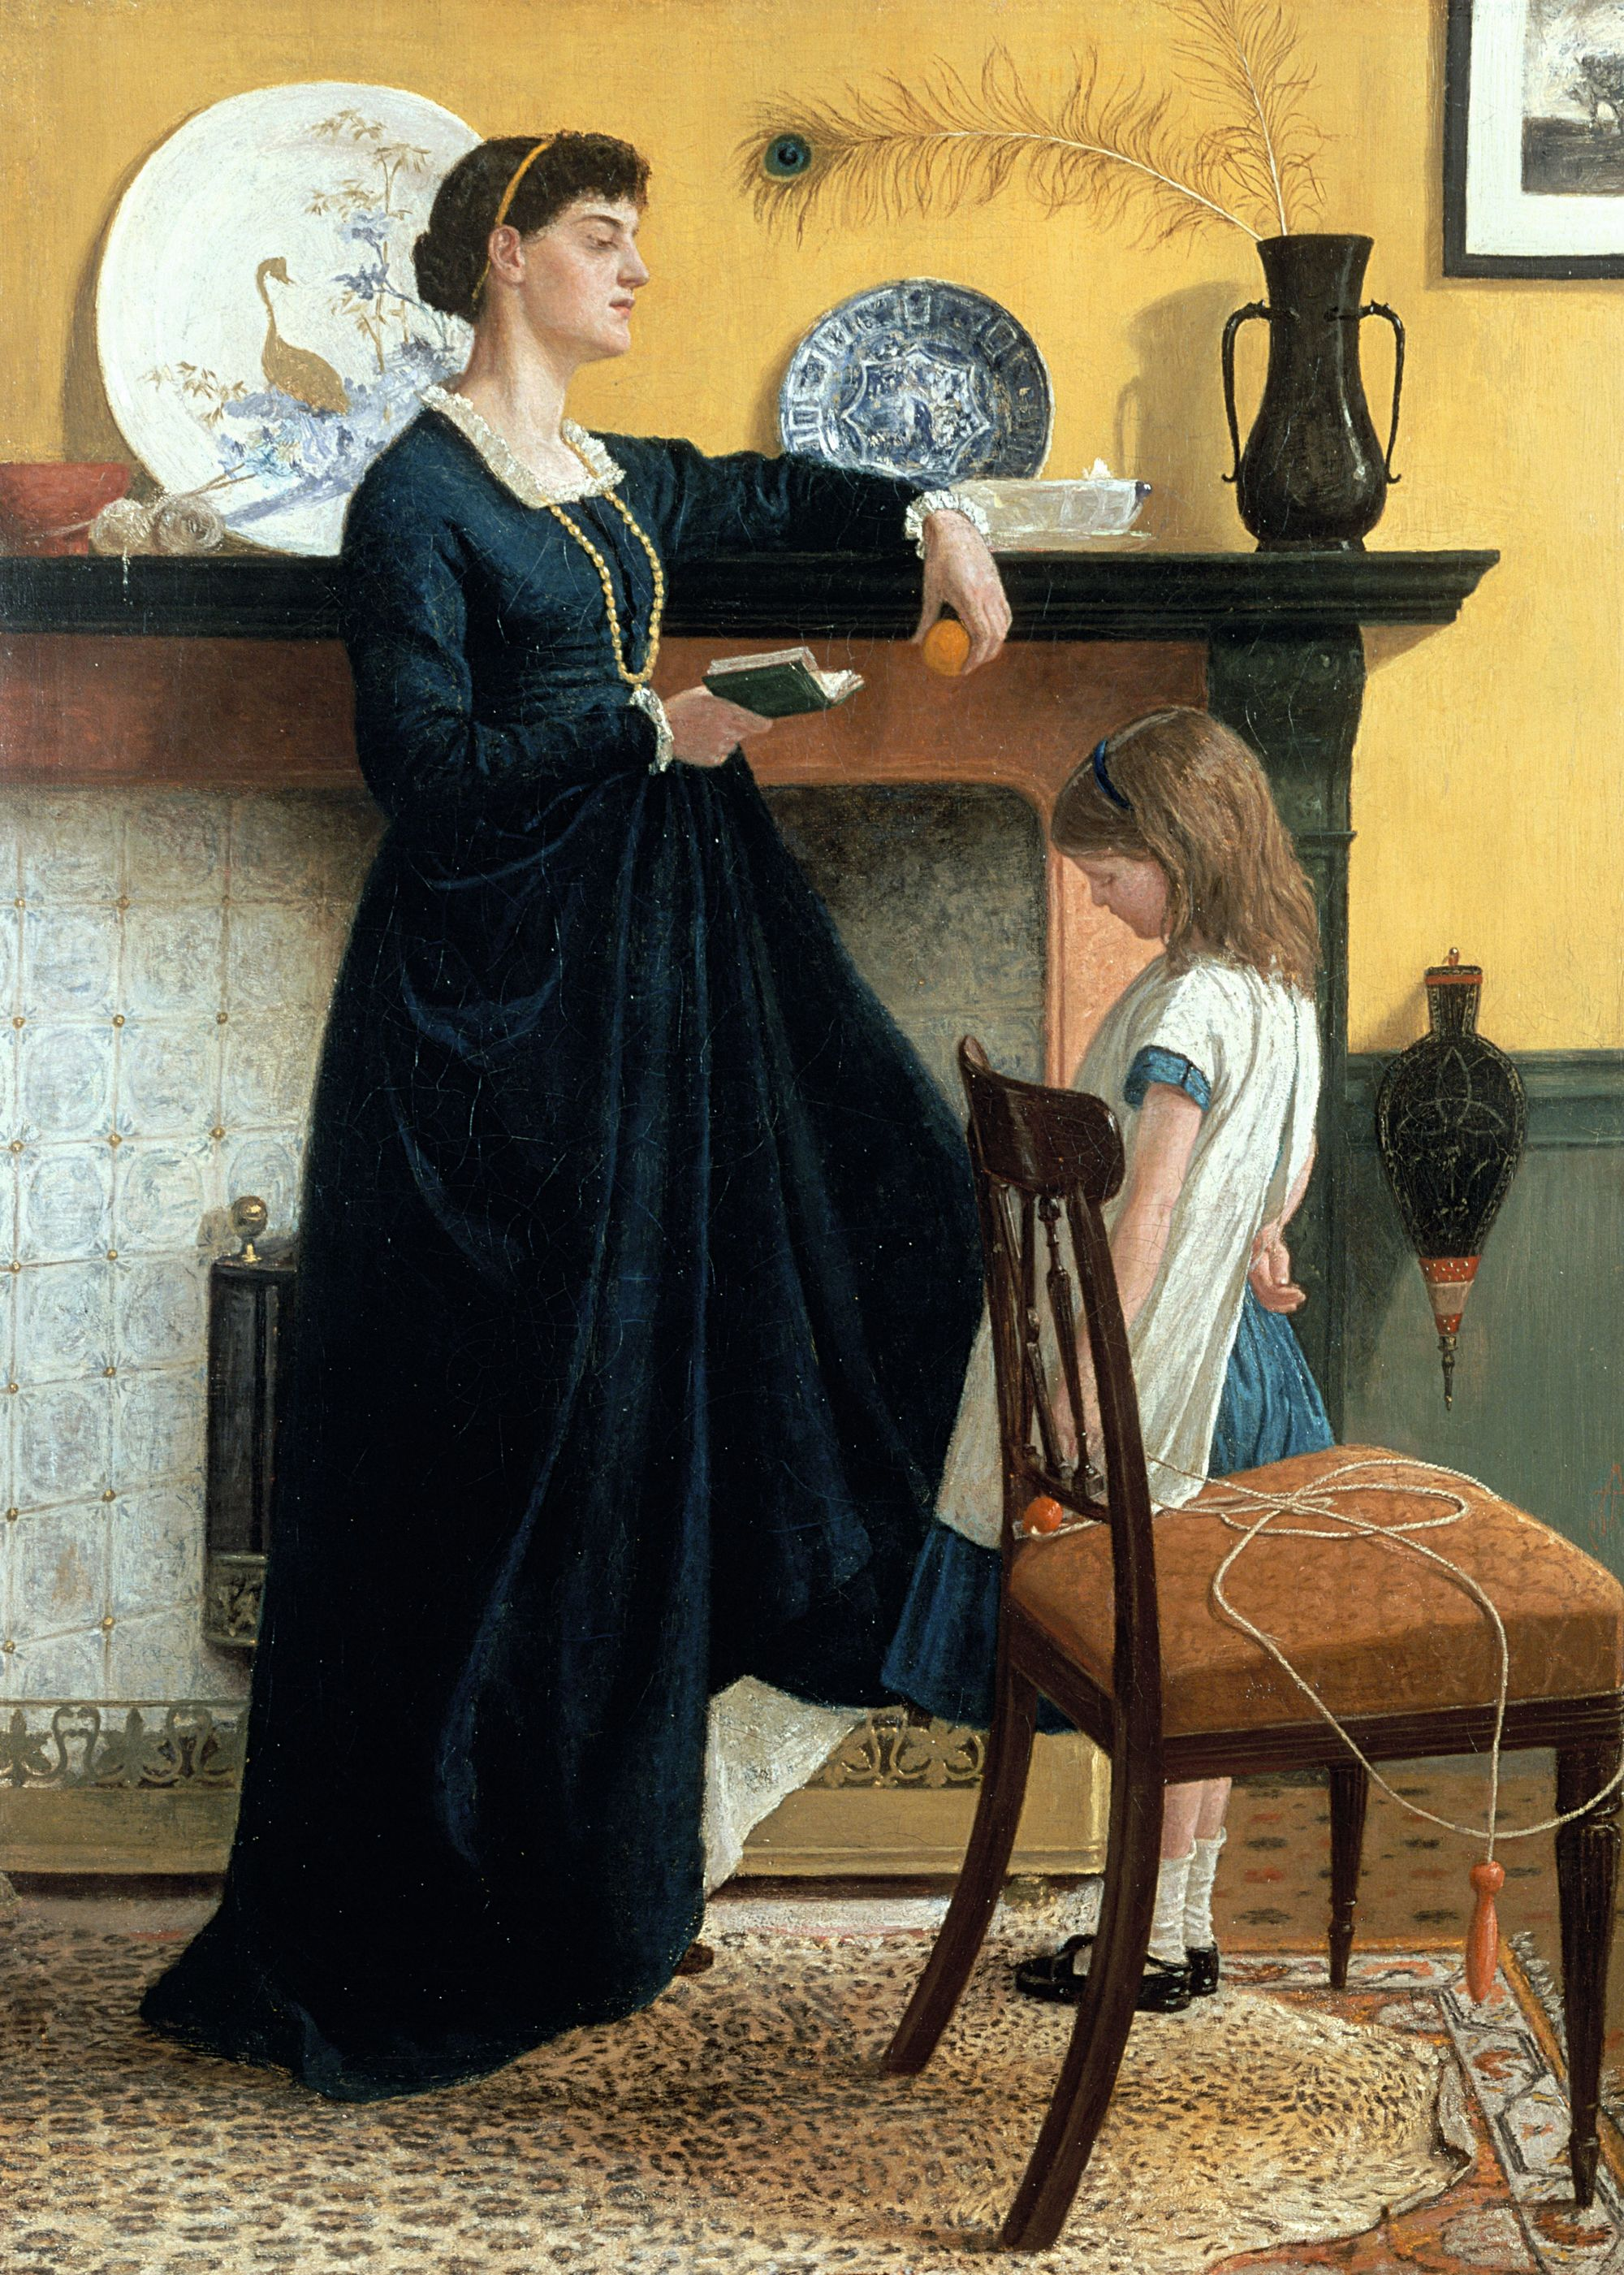 Thomas Armstrong, La leçon, XIXe siècle